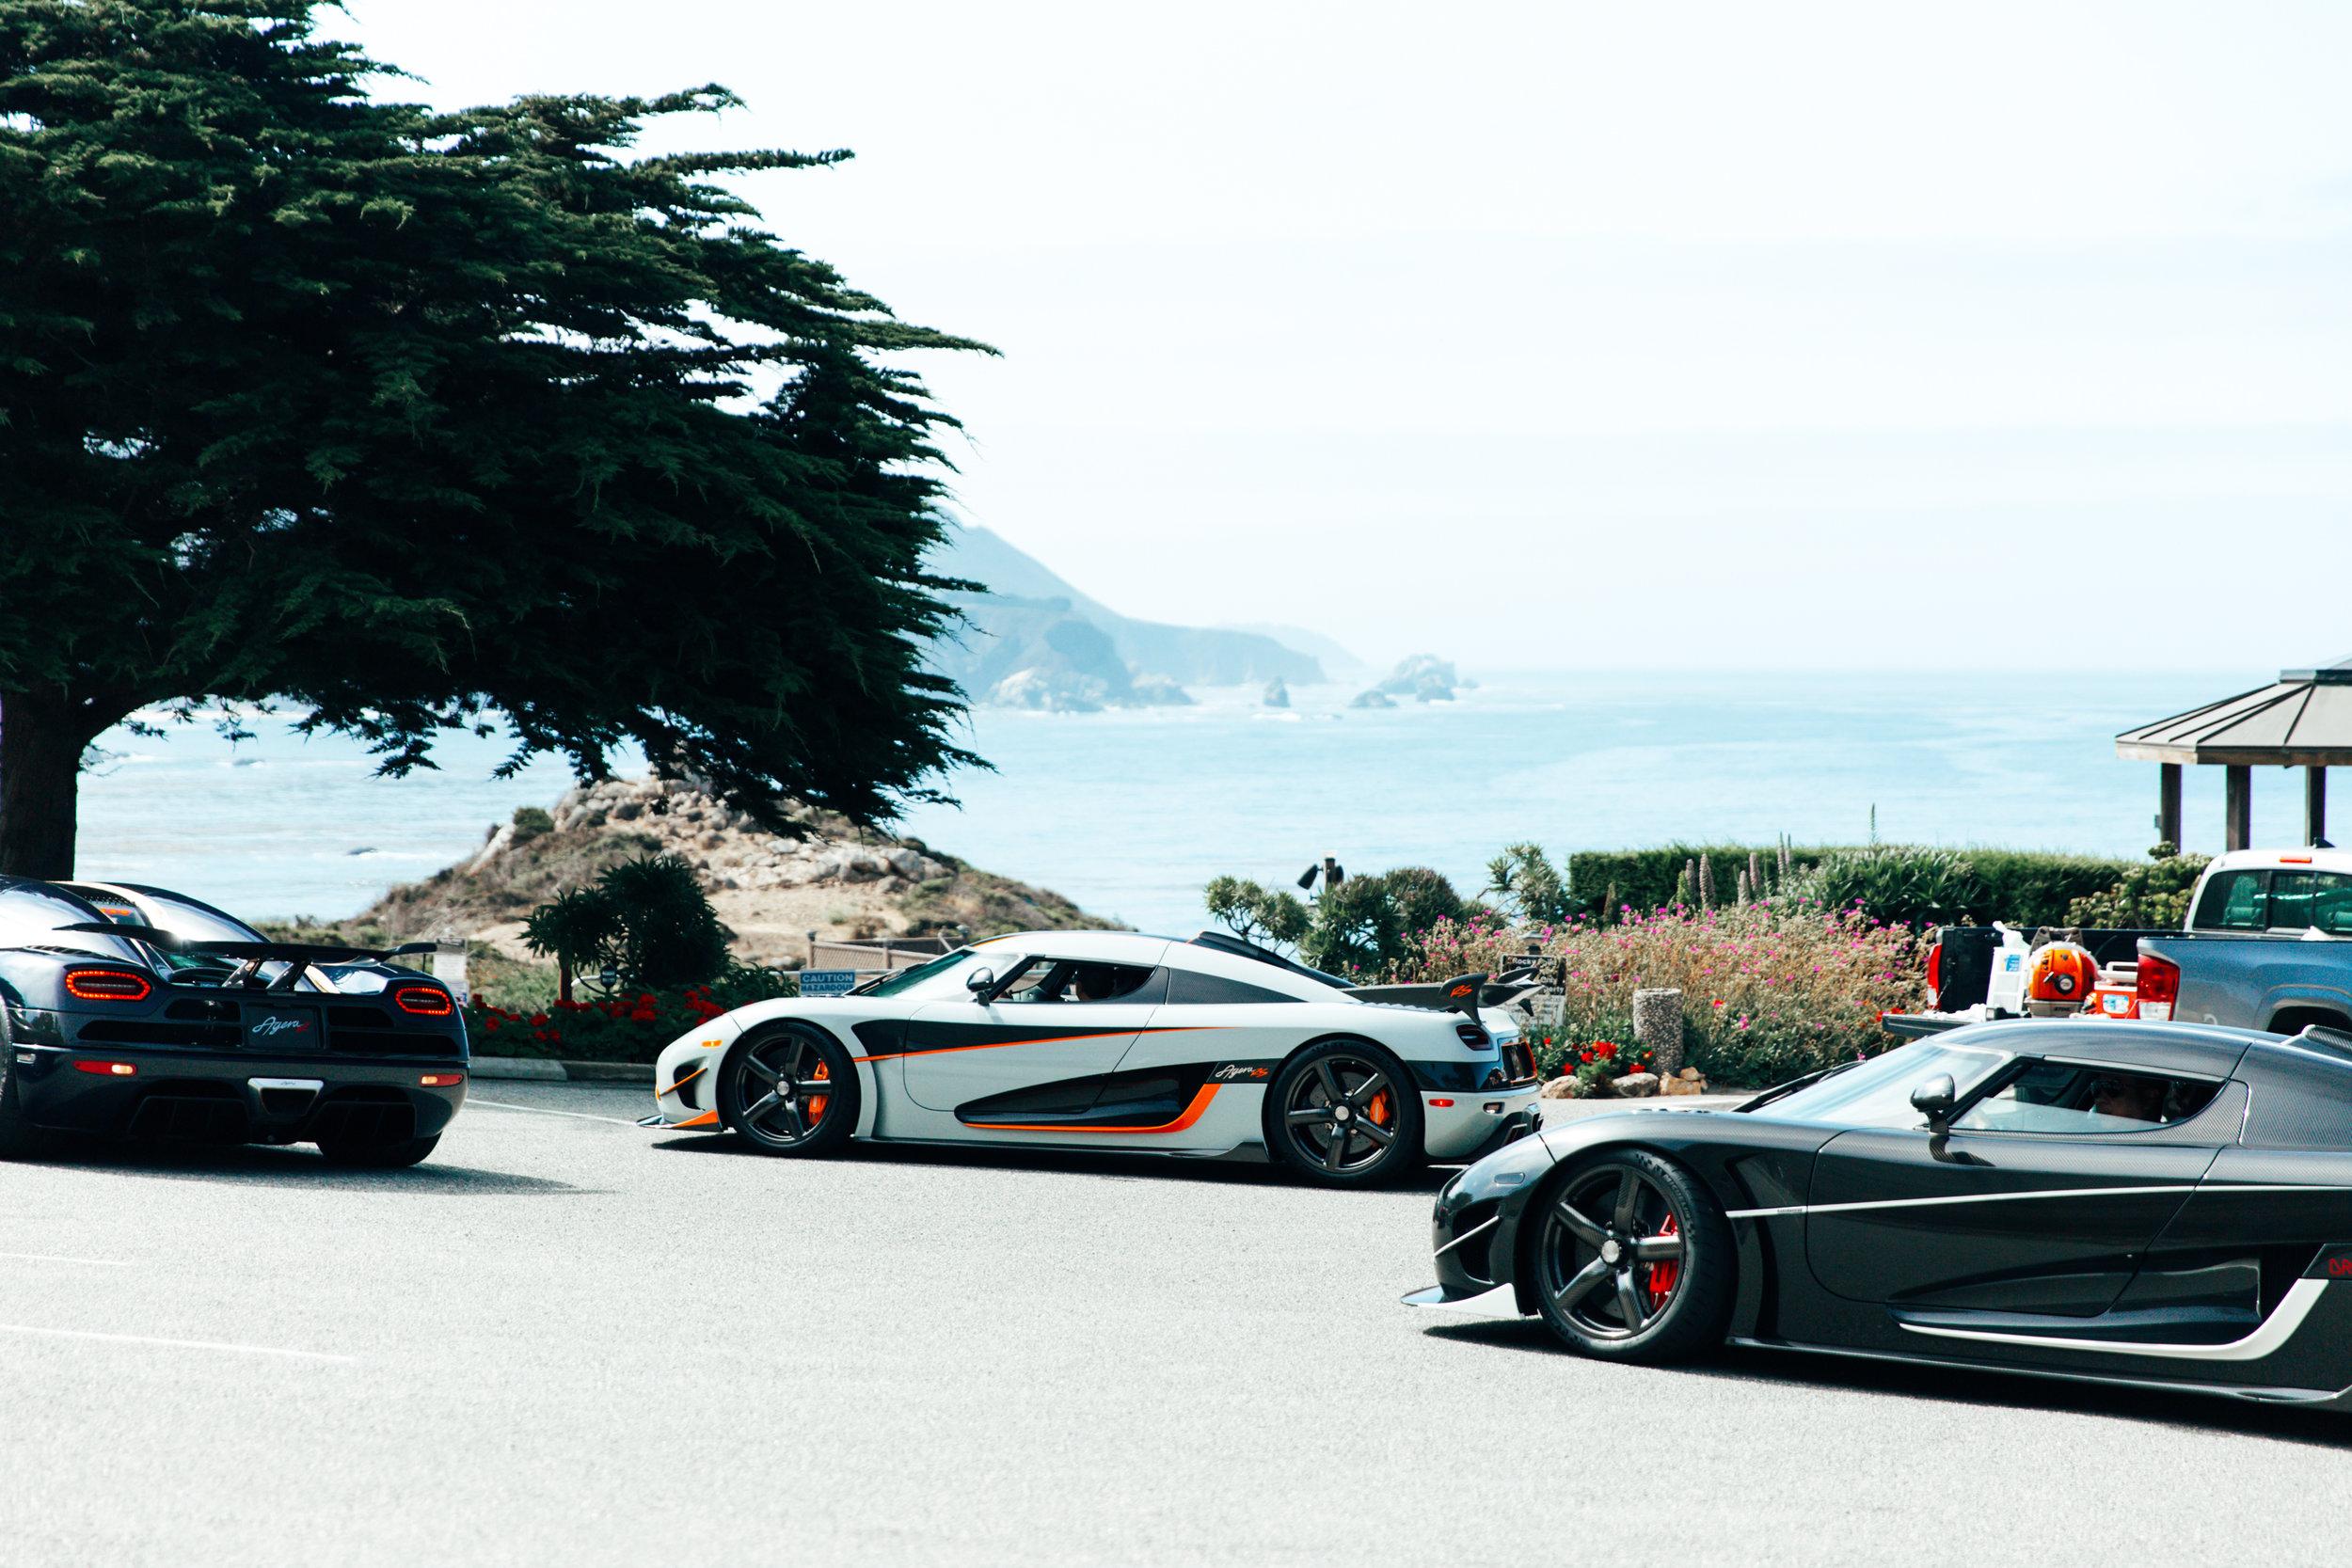 Stay_Driven_Monterey_Car_Week_Koenigsegg-52.jpg